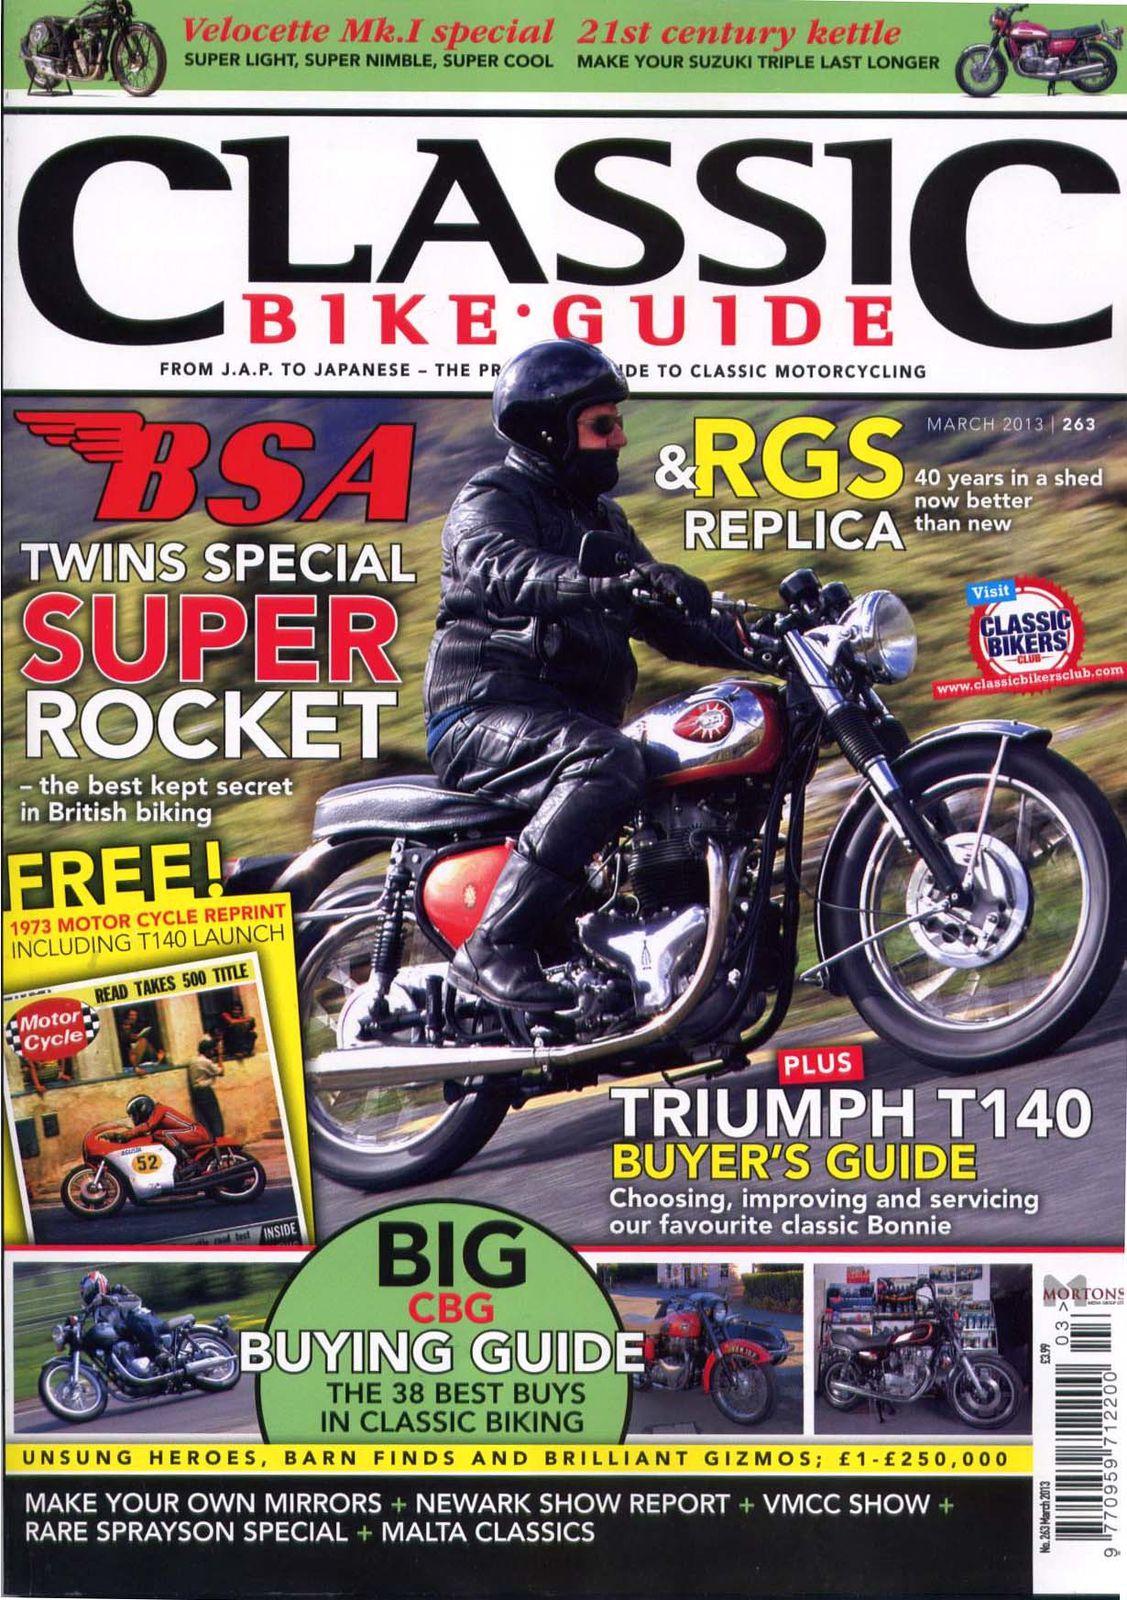 Classique Bike Guide